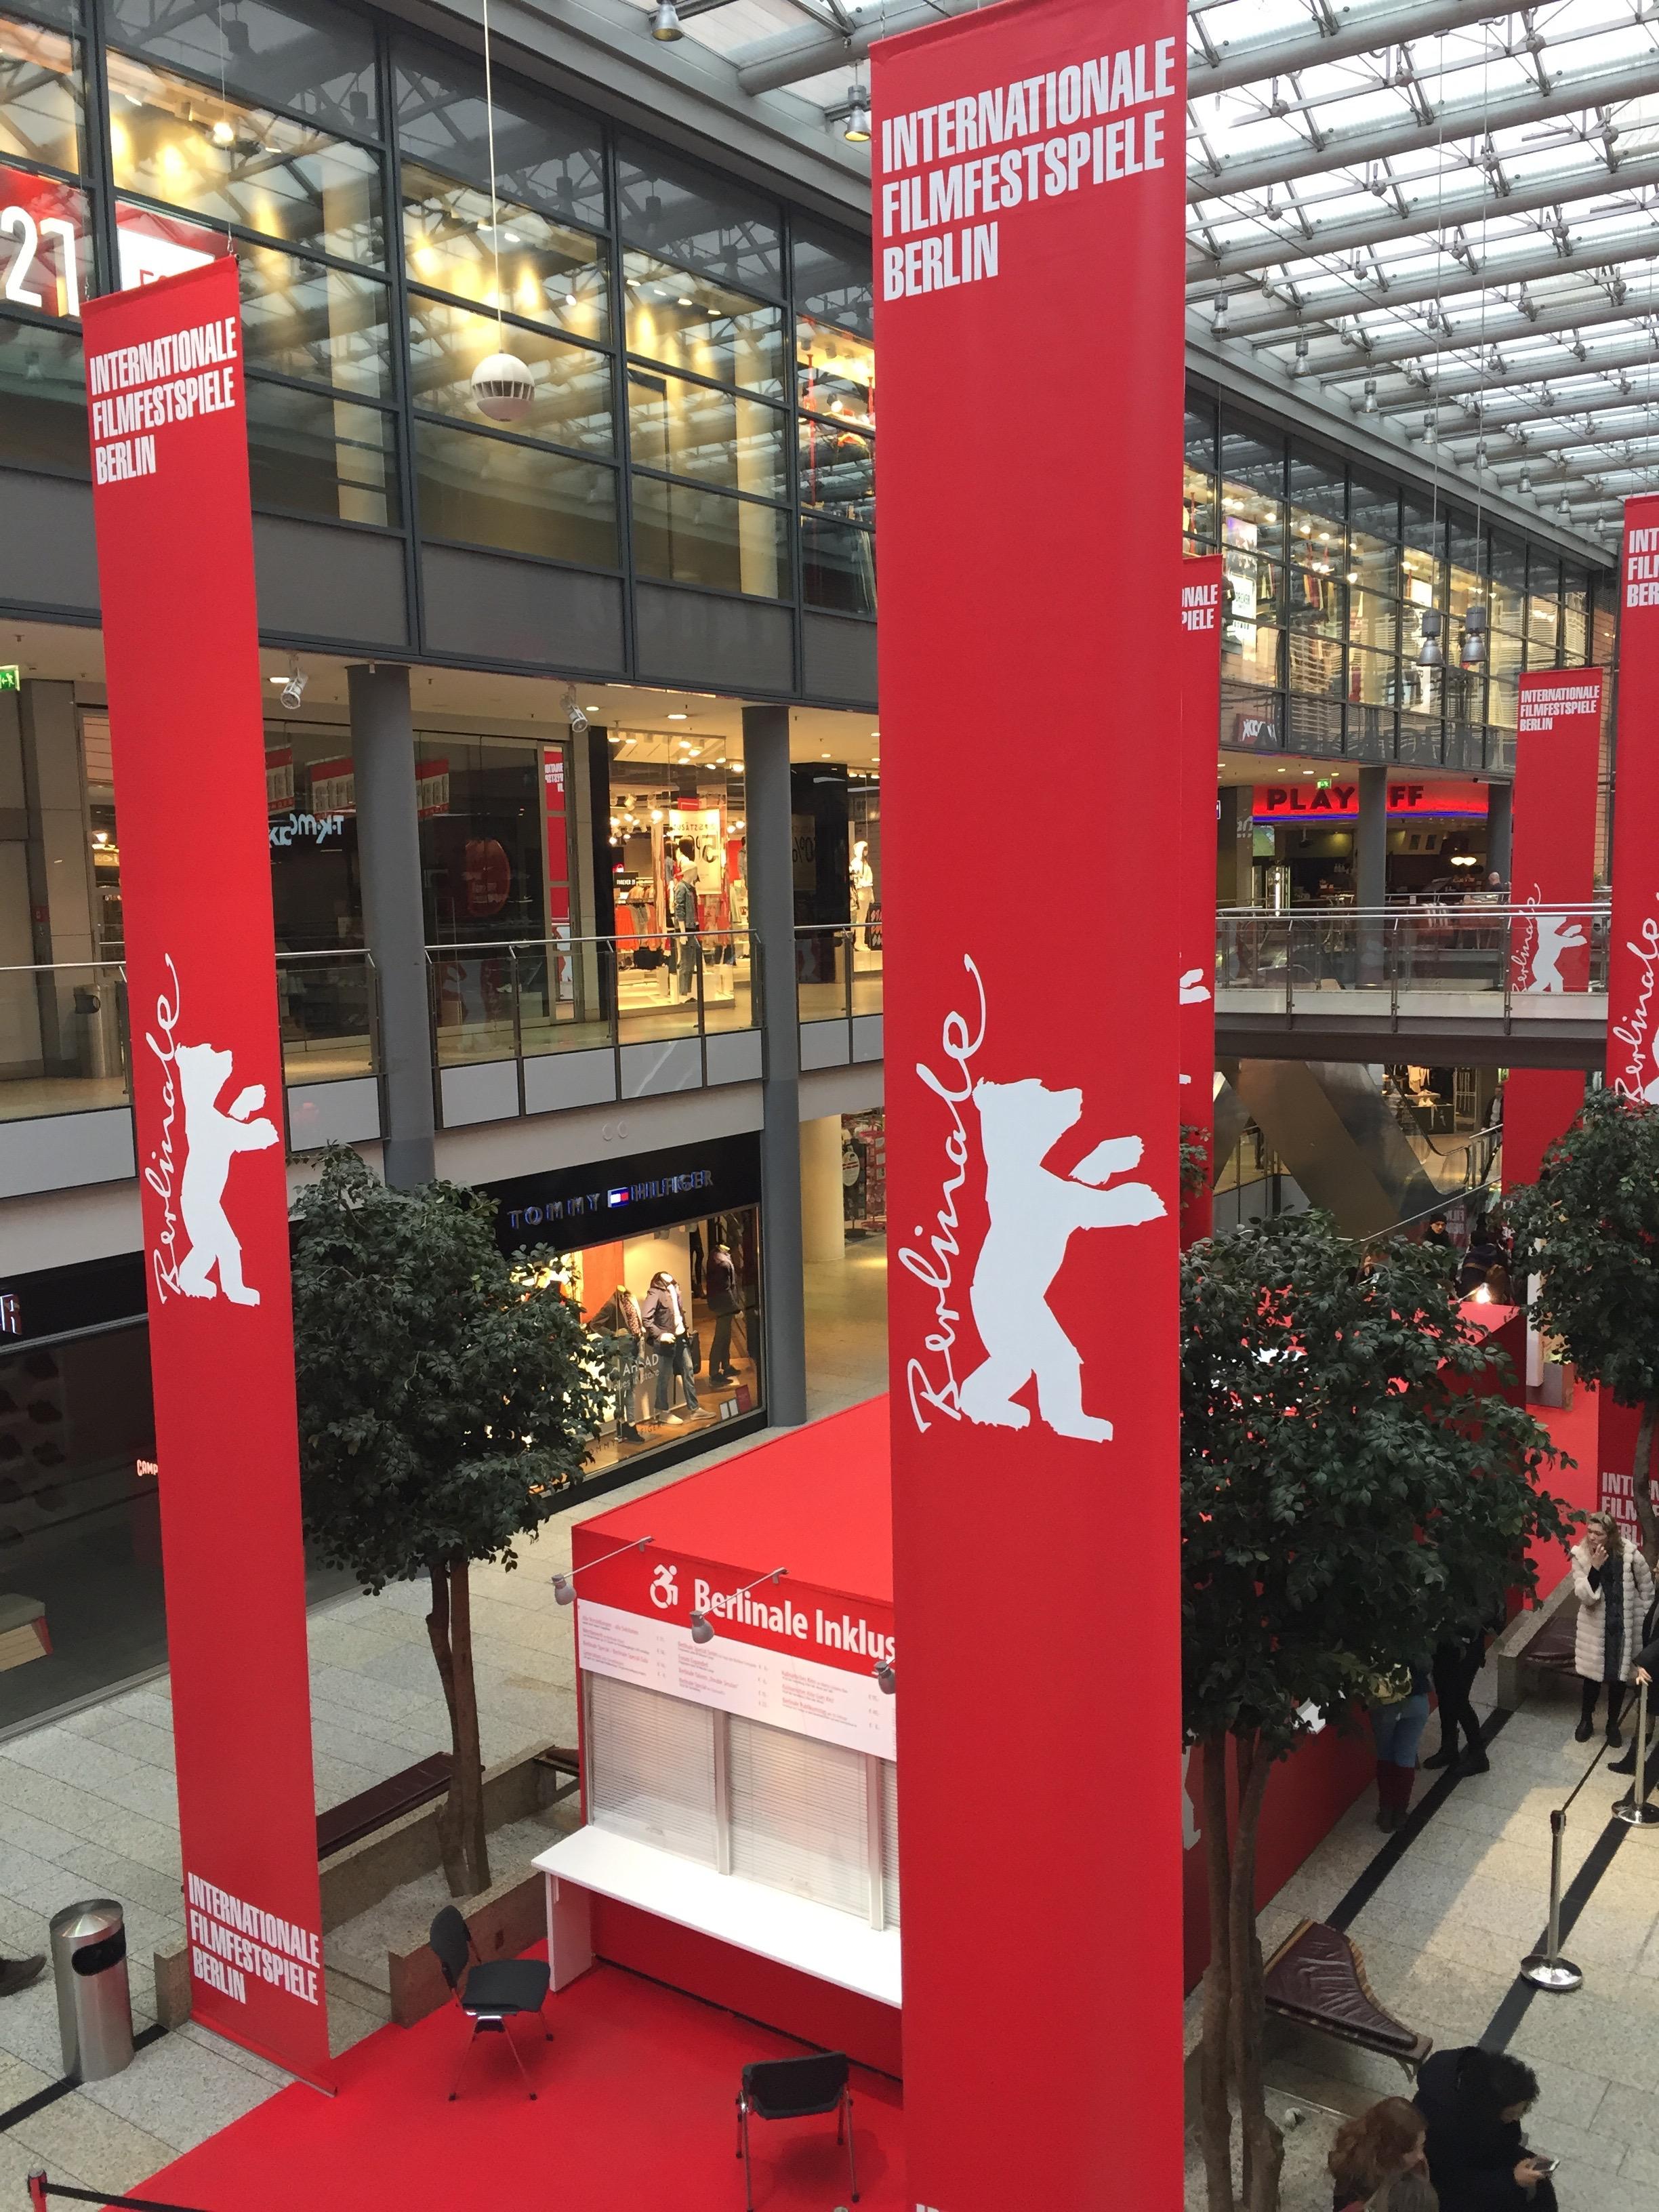 Es geht los - mein erster Berlinale-Tag beginnt!